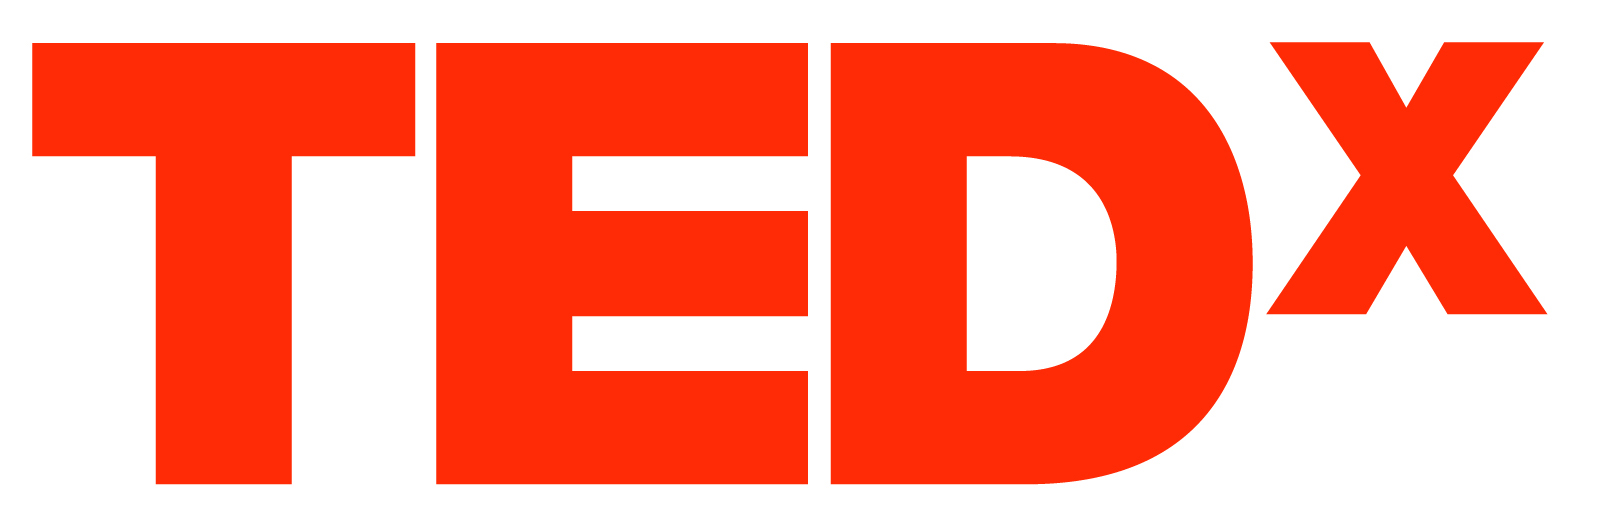 TEDx-logo1.jpg